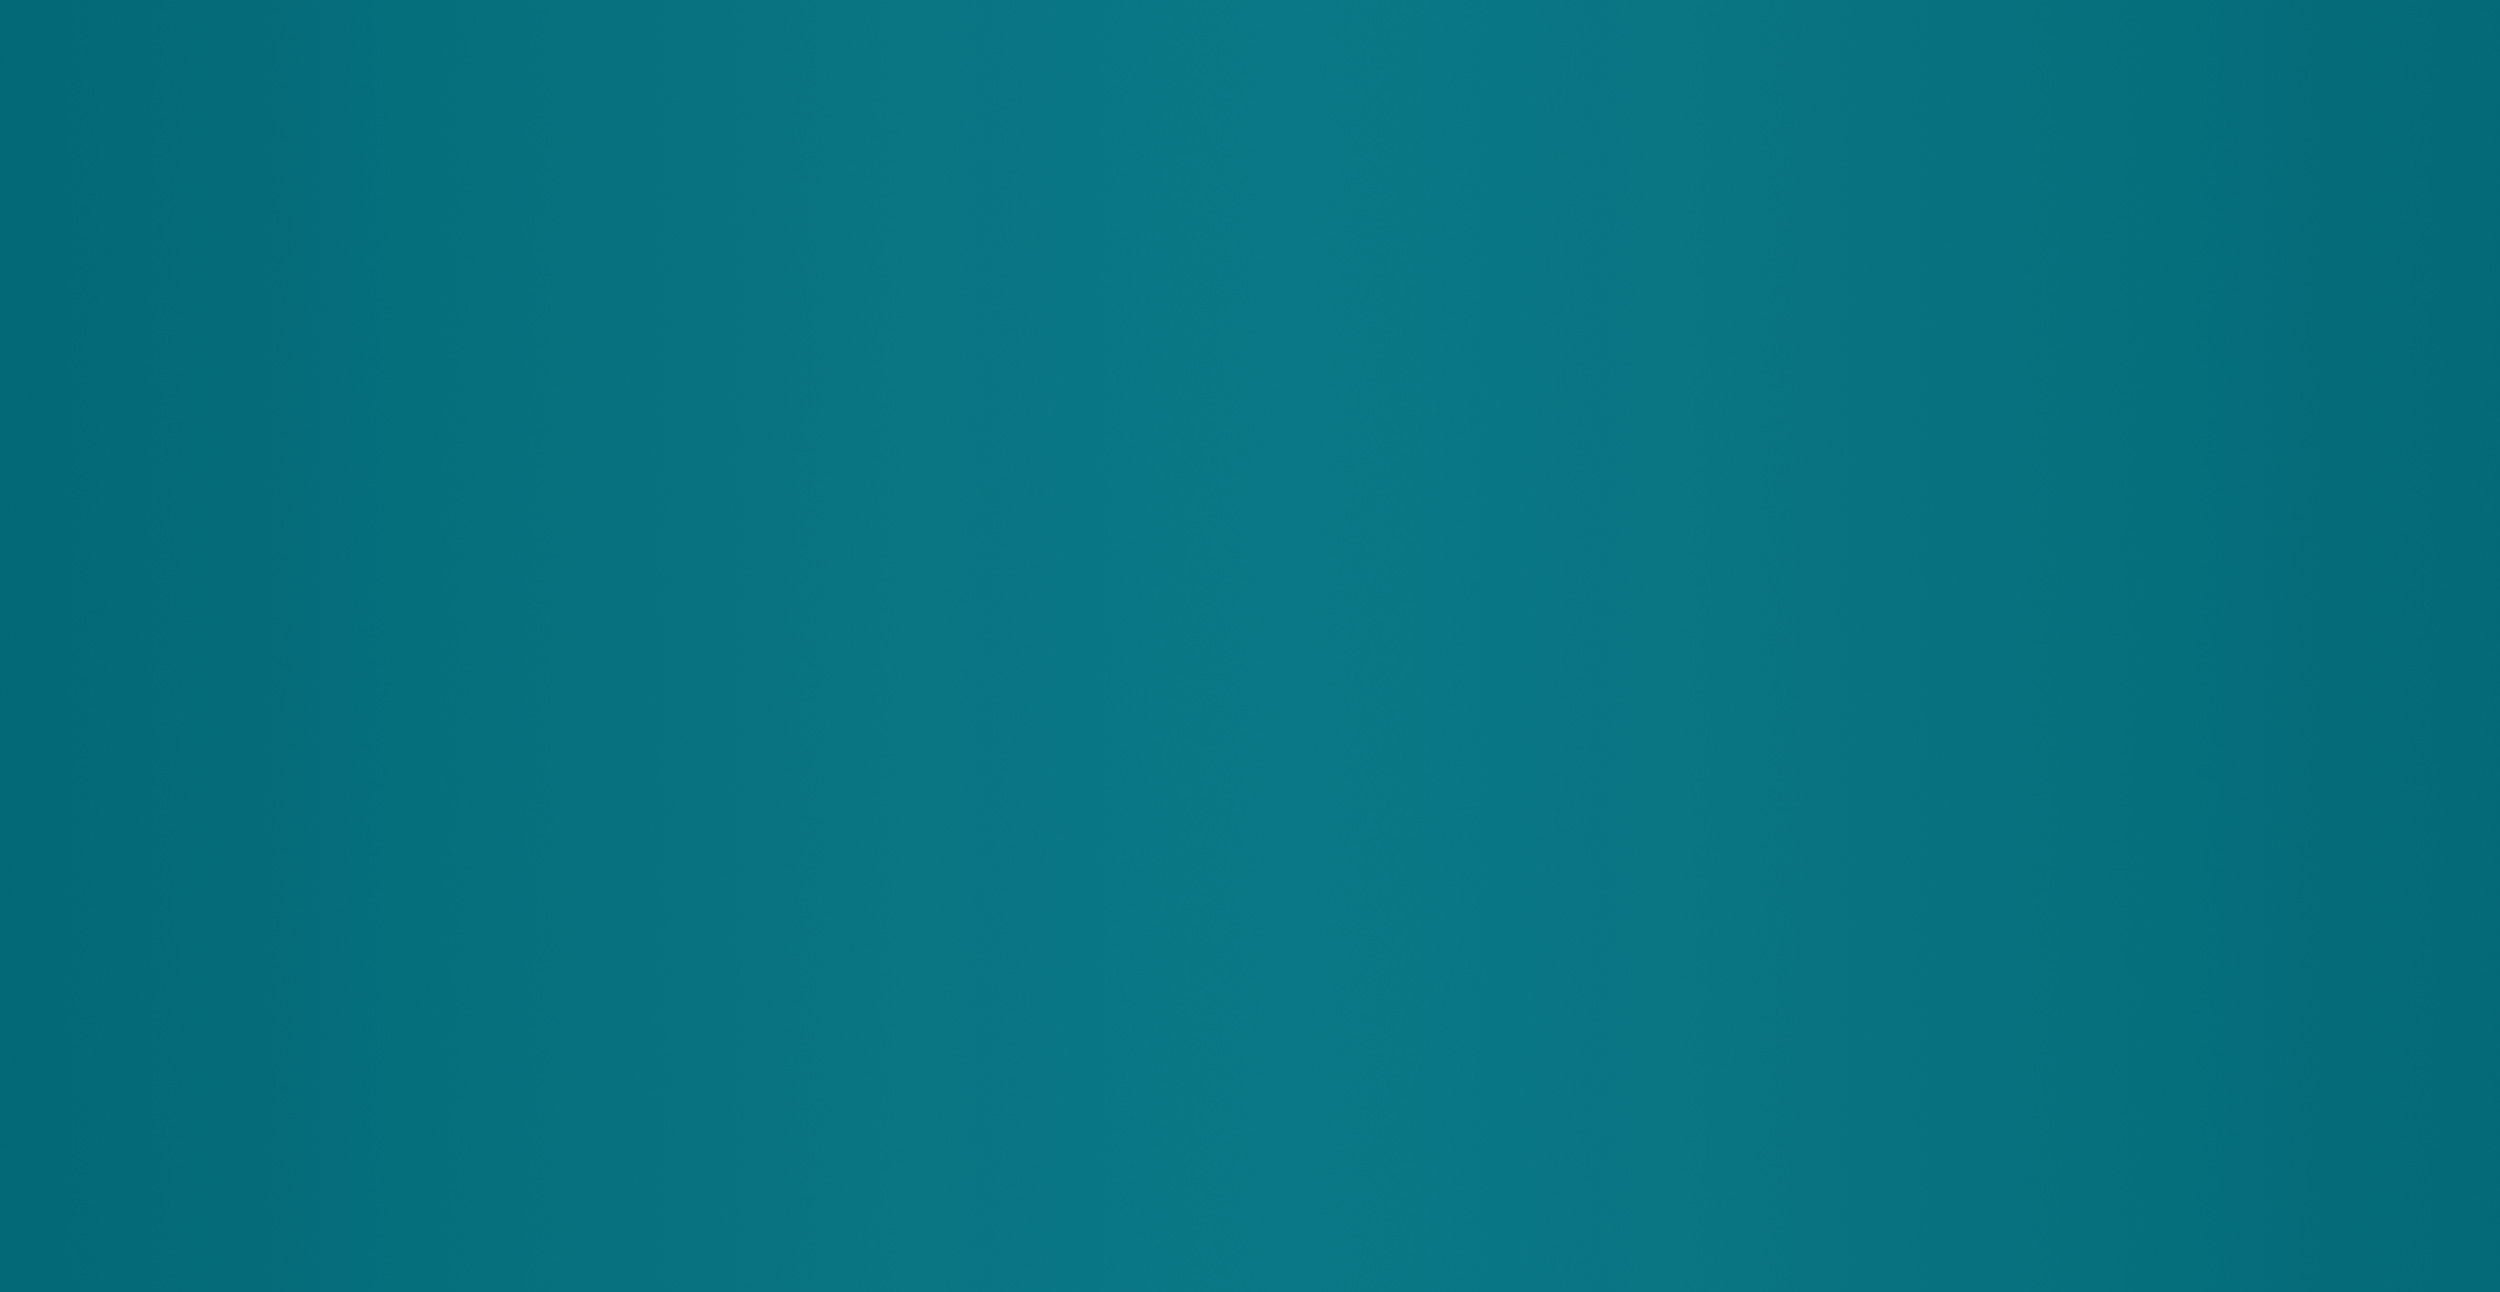 haxagon-blue-stripe.jpg